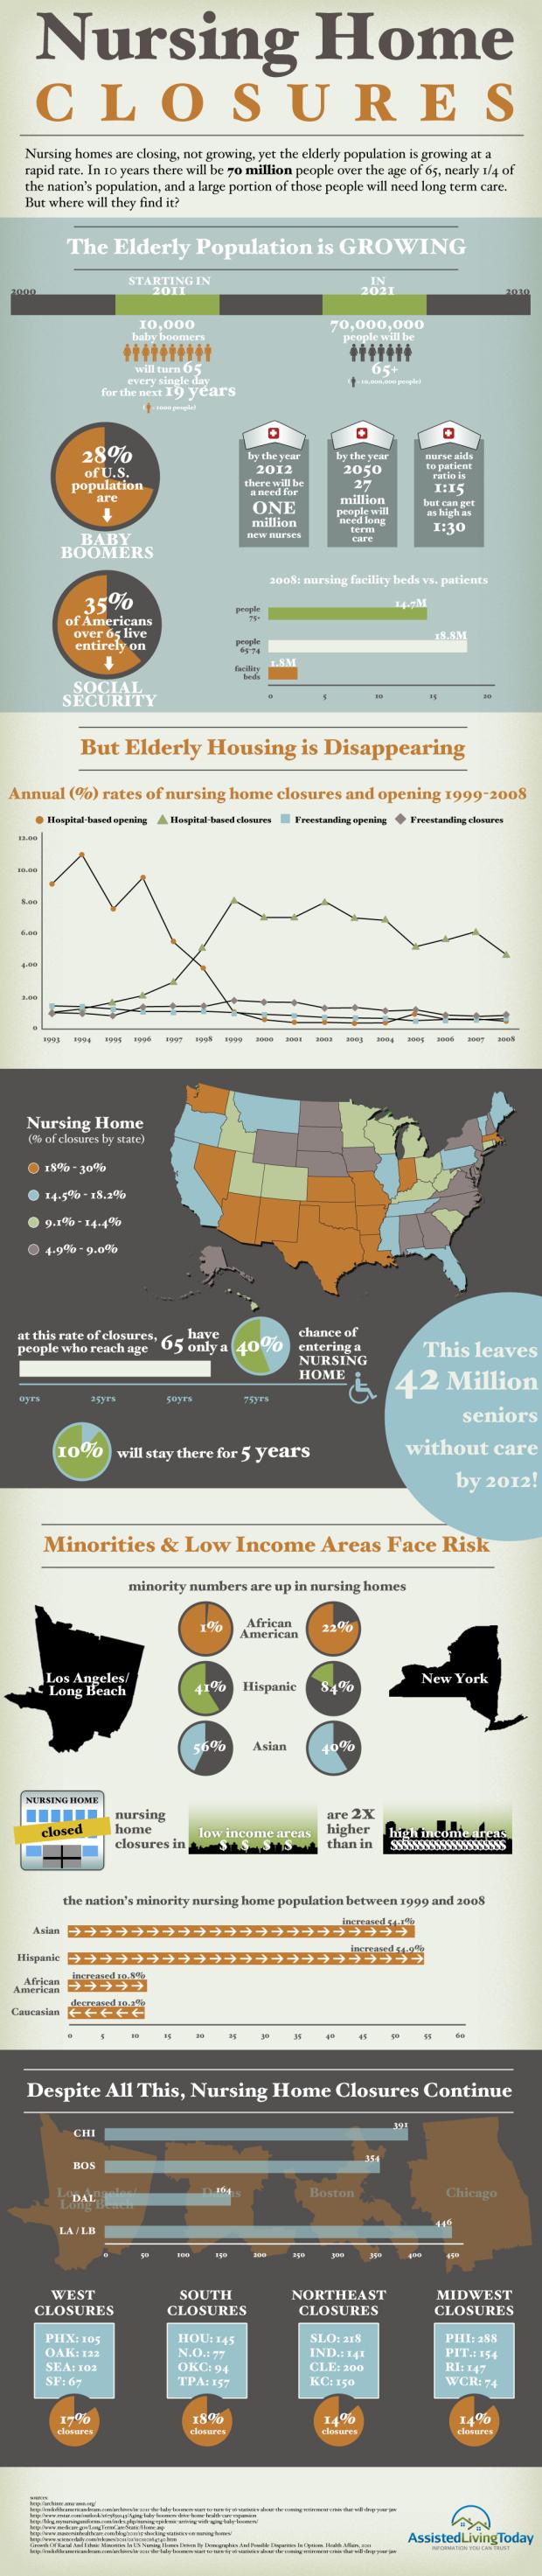 closures-infographic